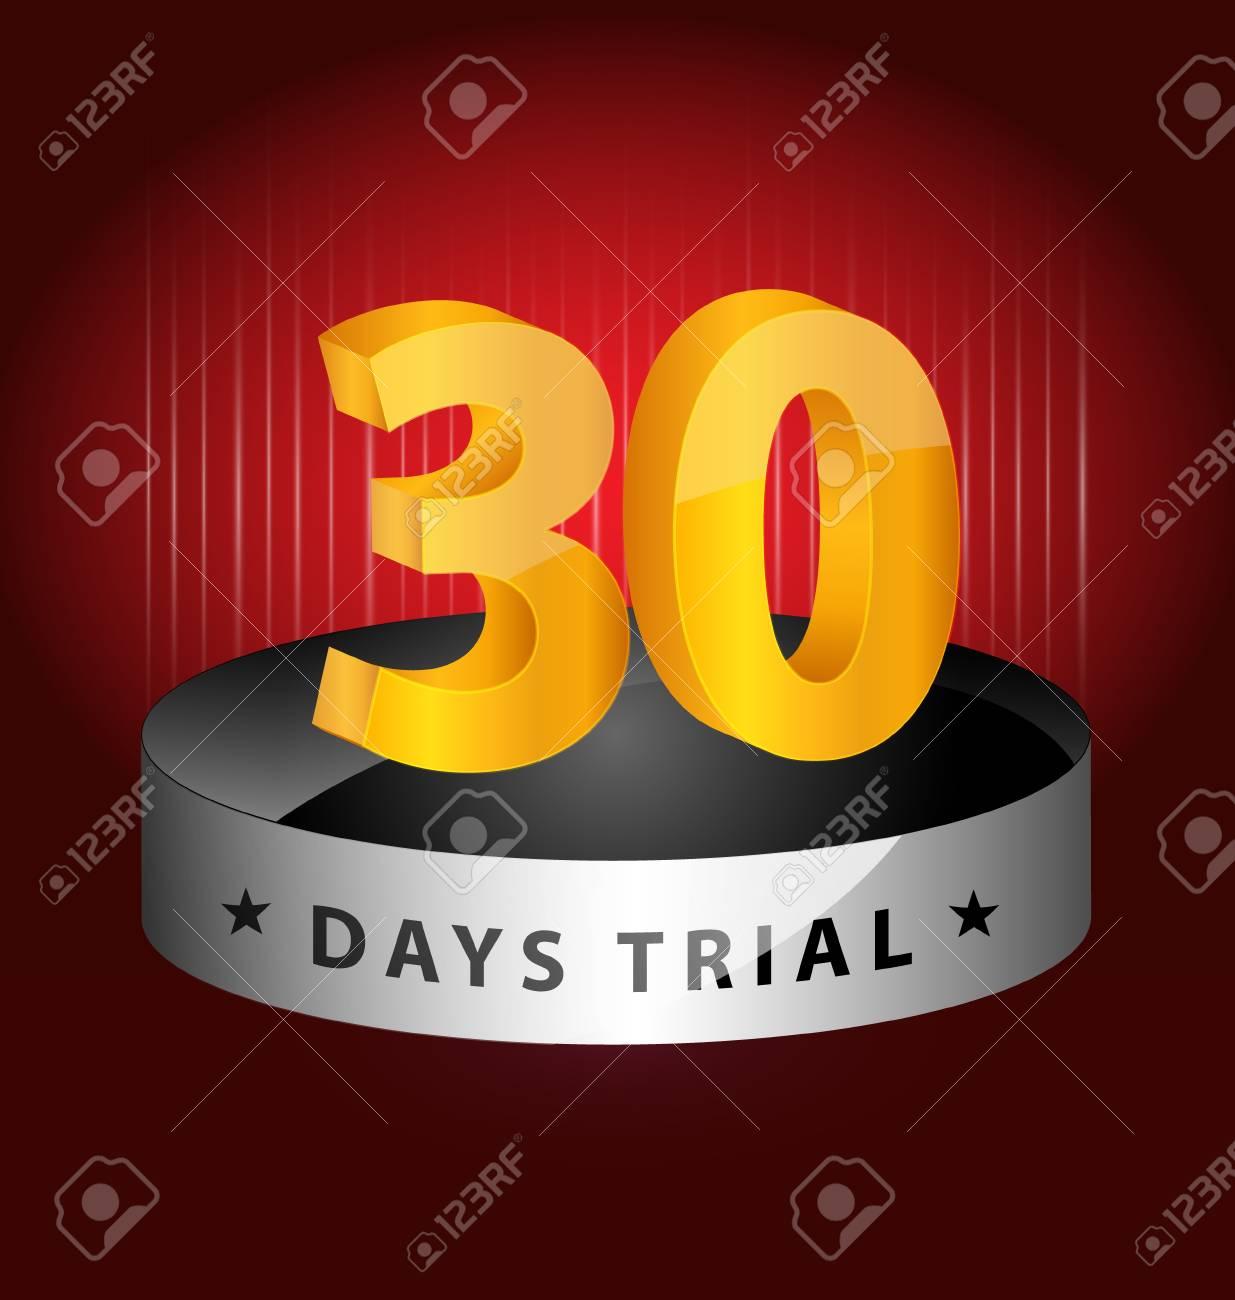 Originally created 30 days trial design element for multipurpose use Stock Vector - 17076328